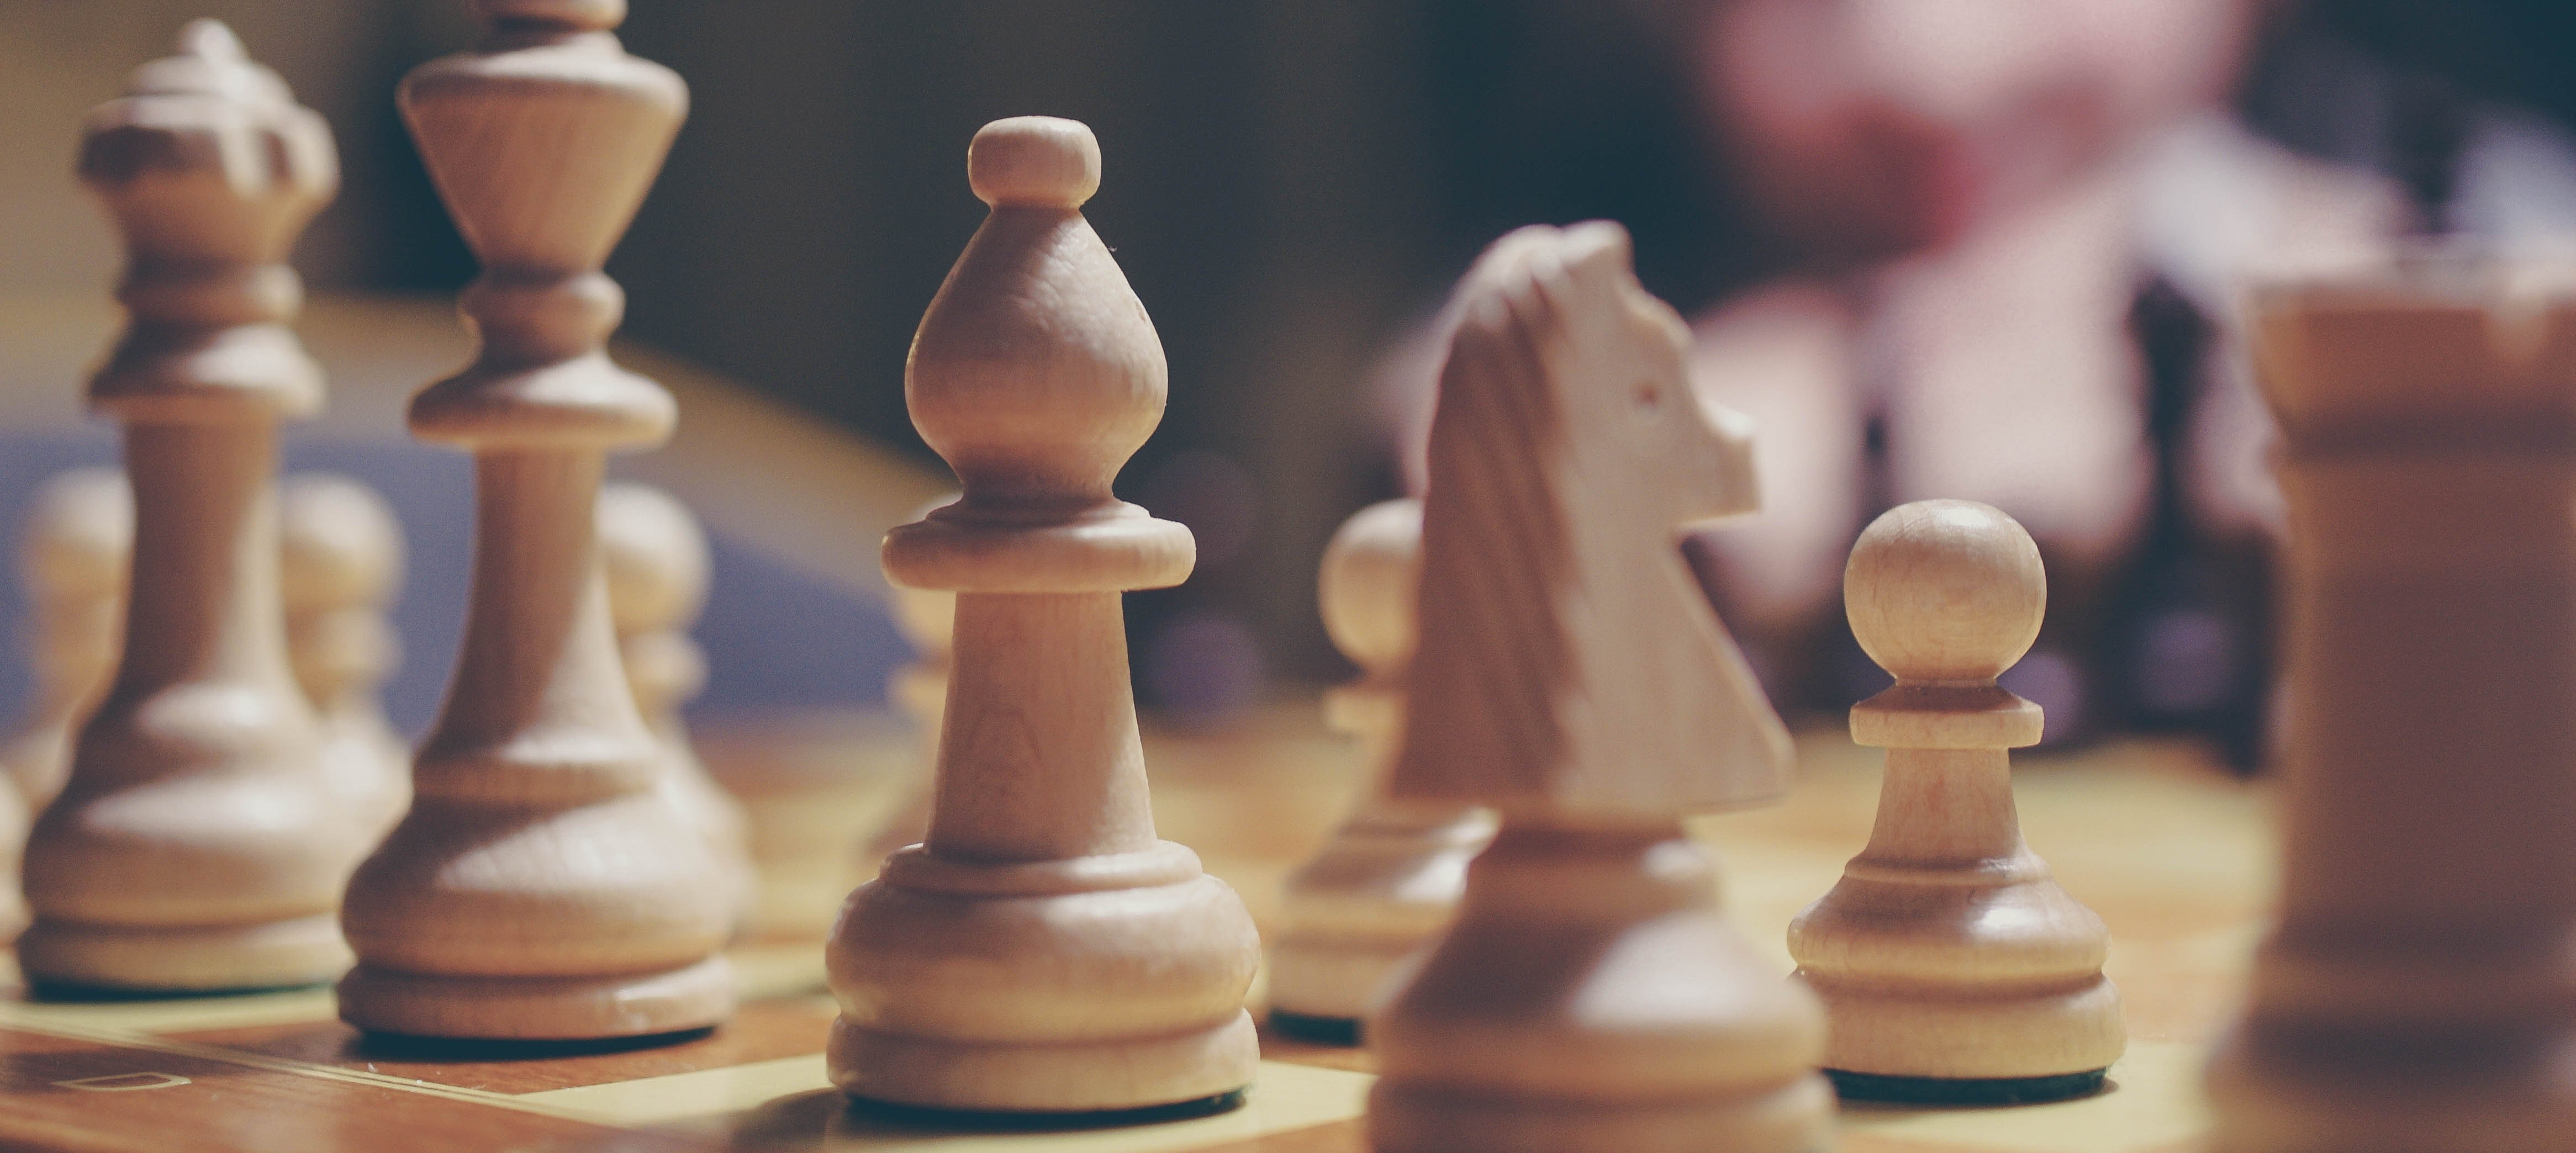 estrategia marketing ajedrez tablero comandos campaña plan marketing-502892-edited.jpg